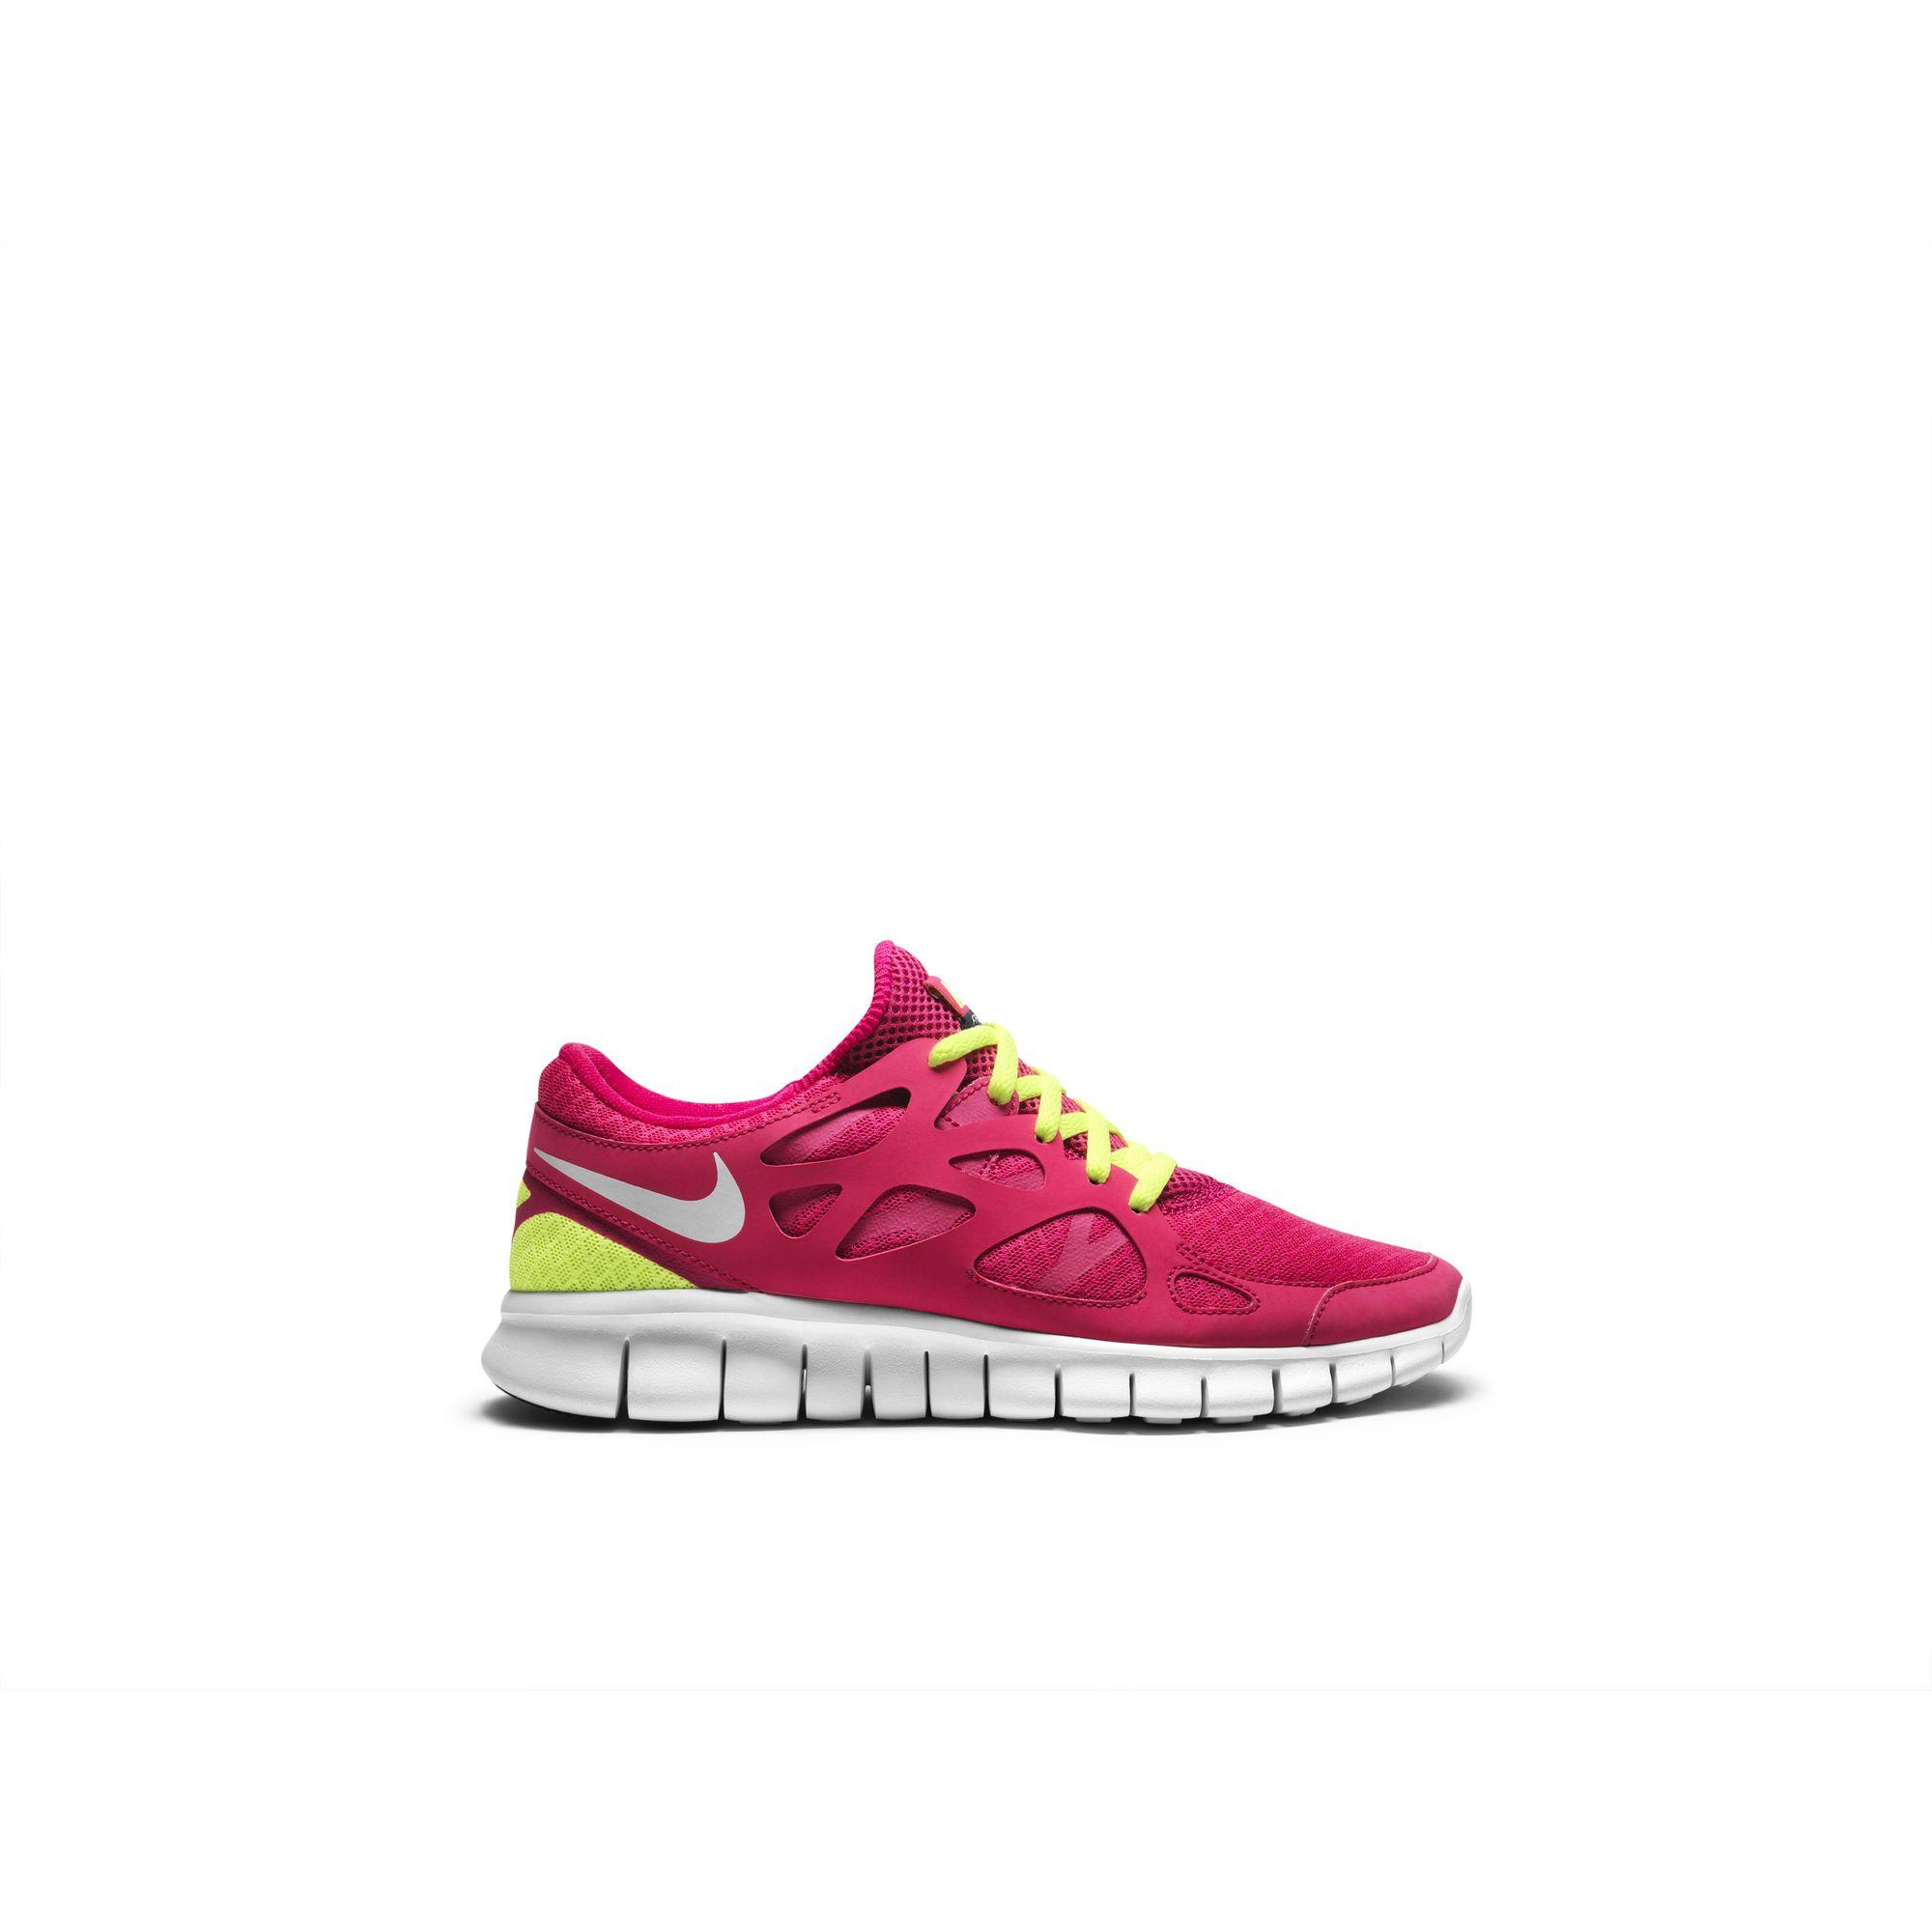 Nike Free Run 2 Womens Running Shoe Black White Magenta 38530 Low Price